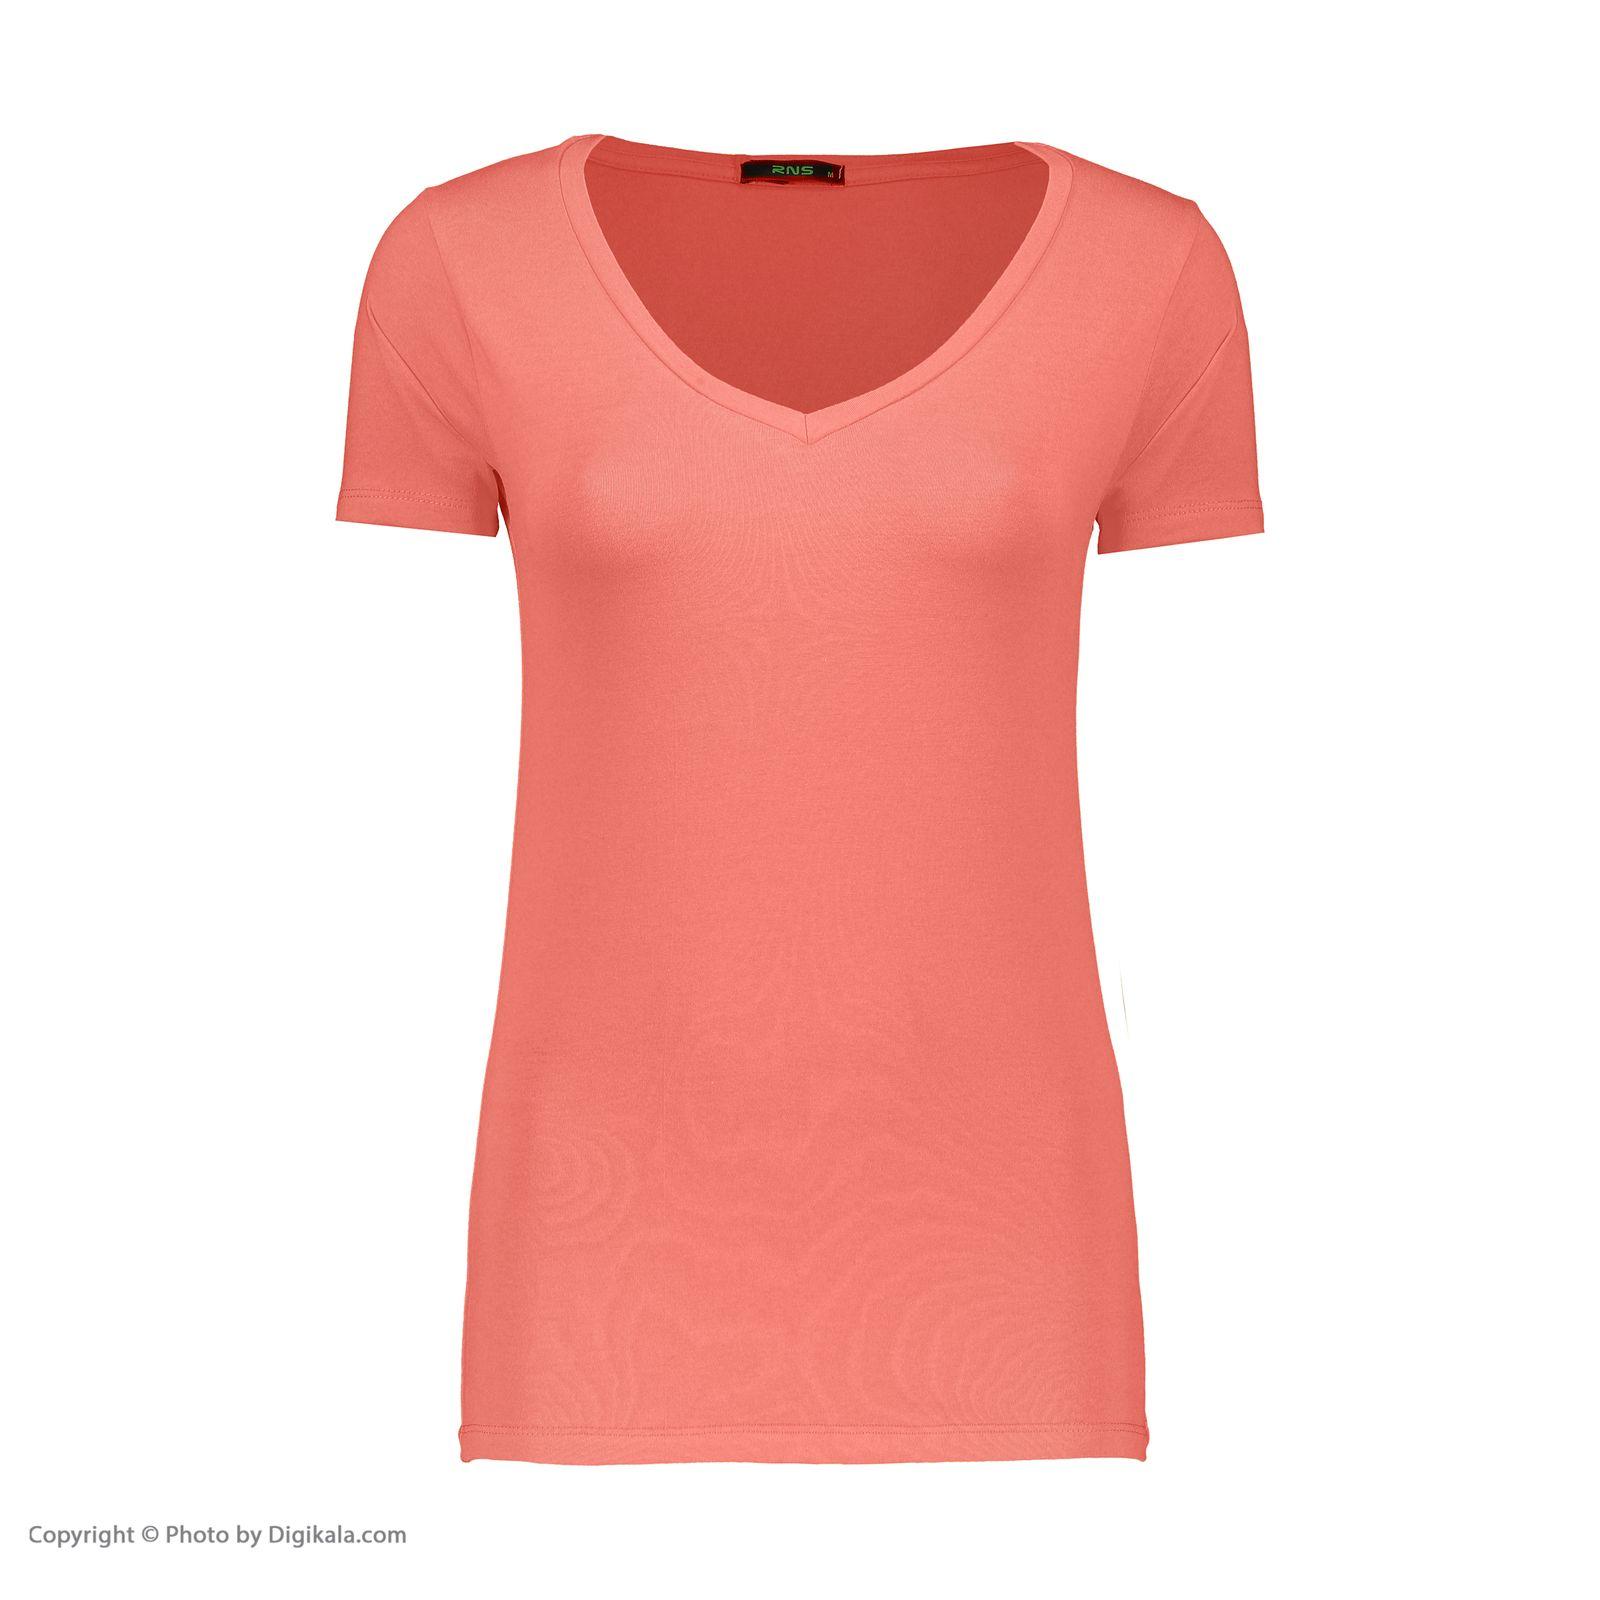 تی شرت زنانه آر ان اس مدل 1102077-80